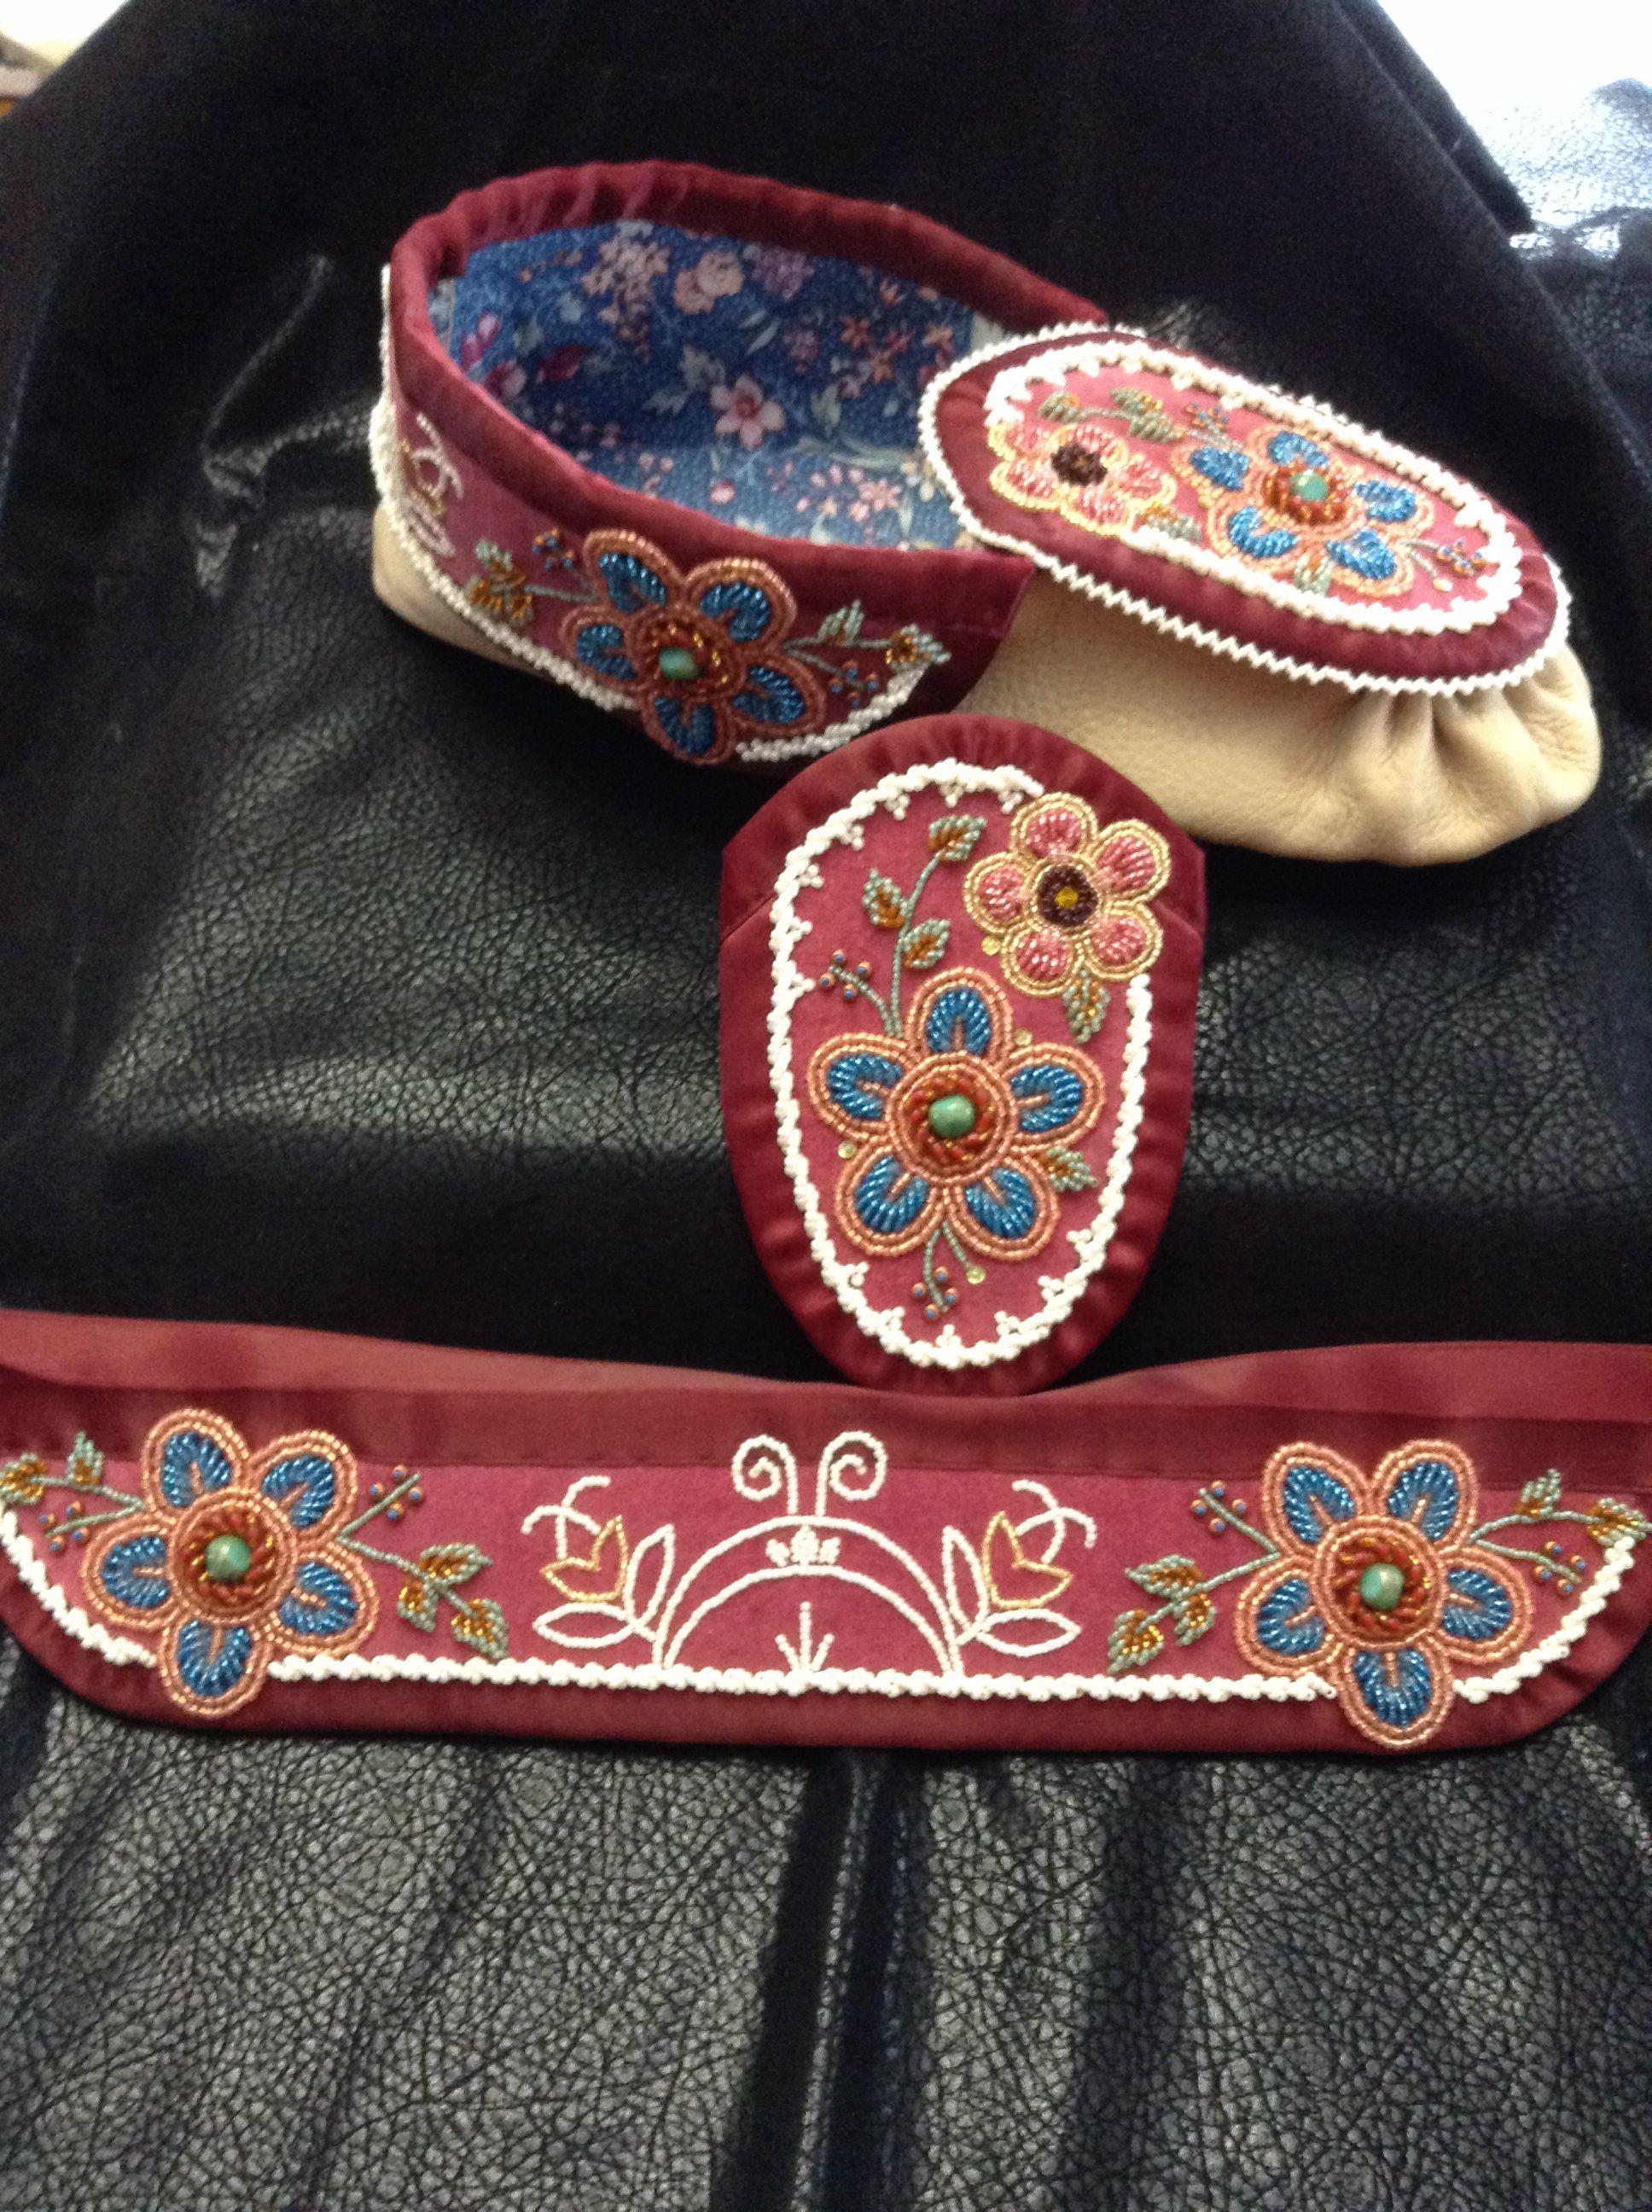 Iroquois style raised beadwork by Sadie Thompson